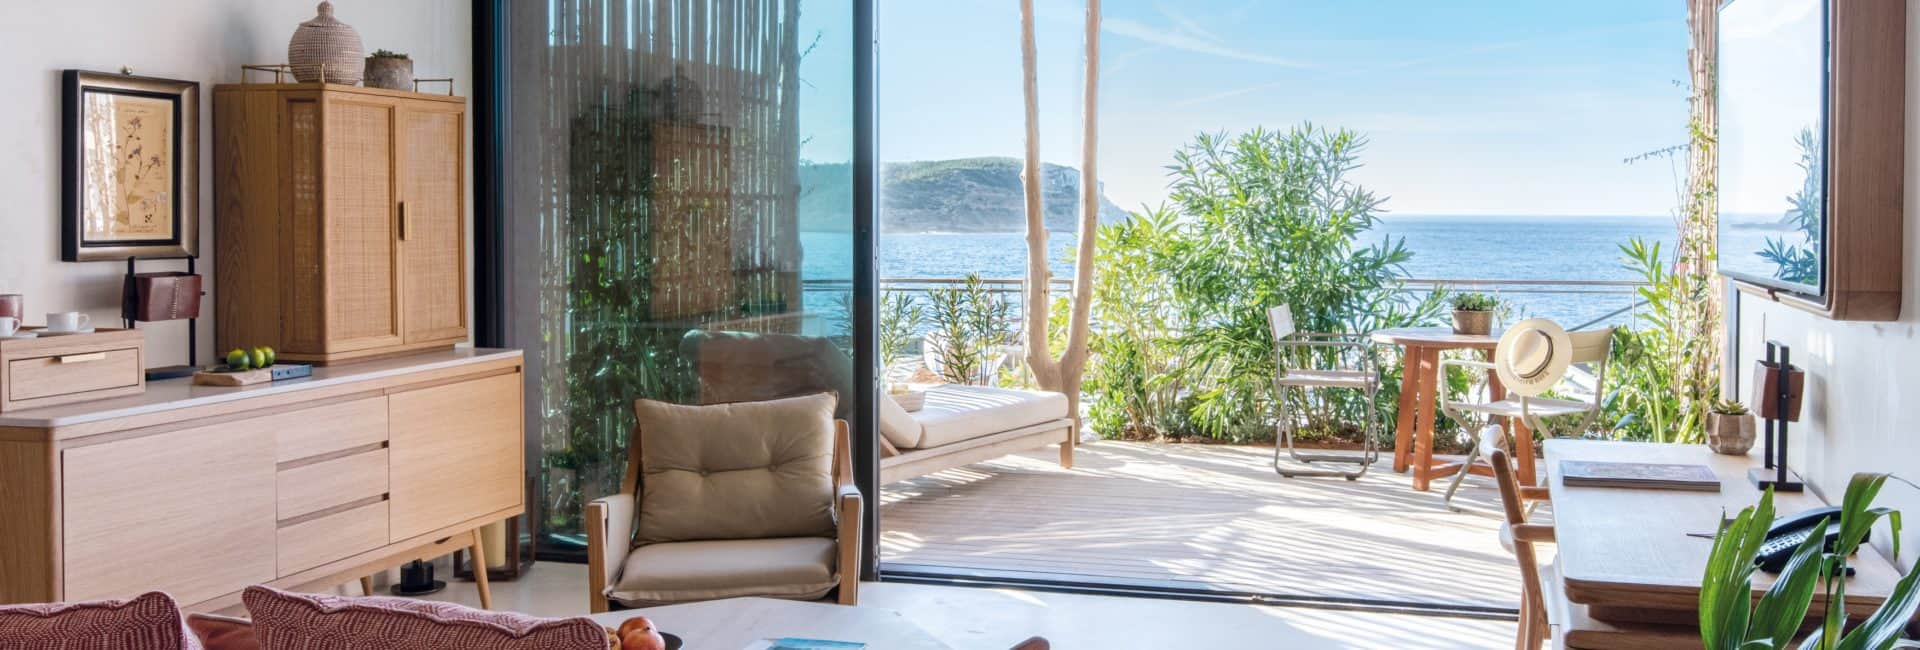 Six Senses Ibiza